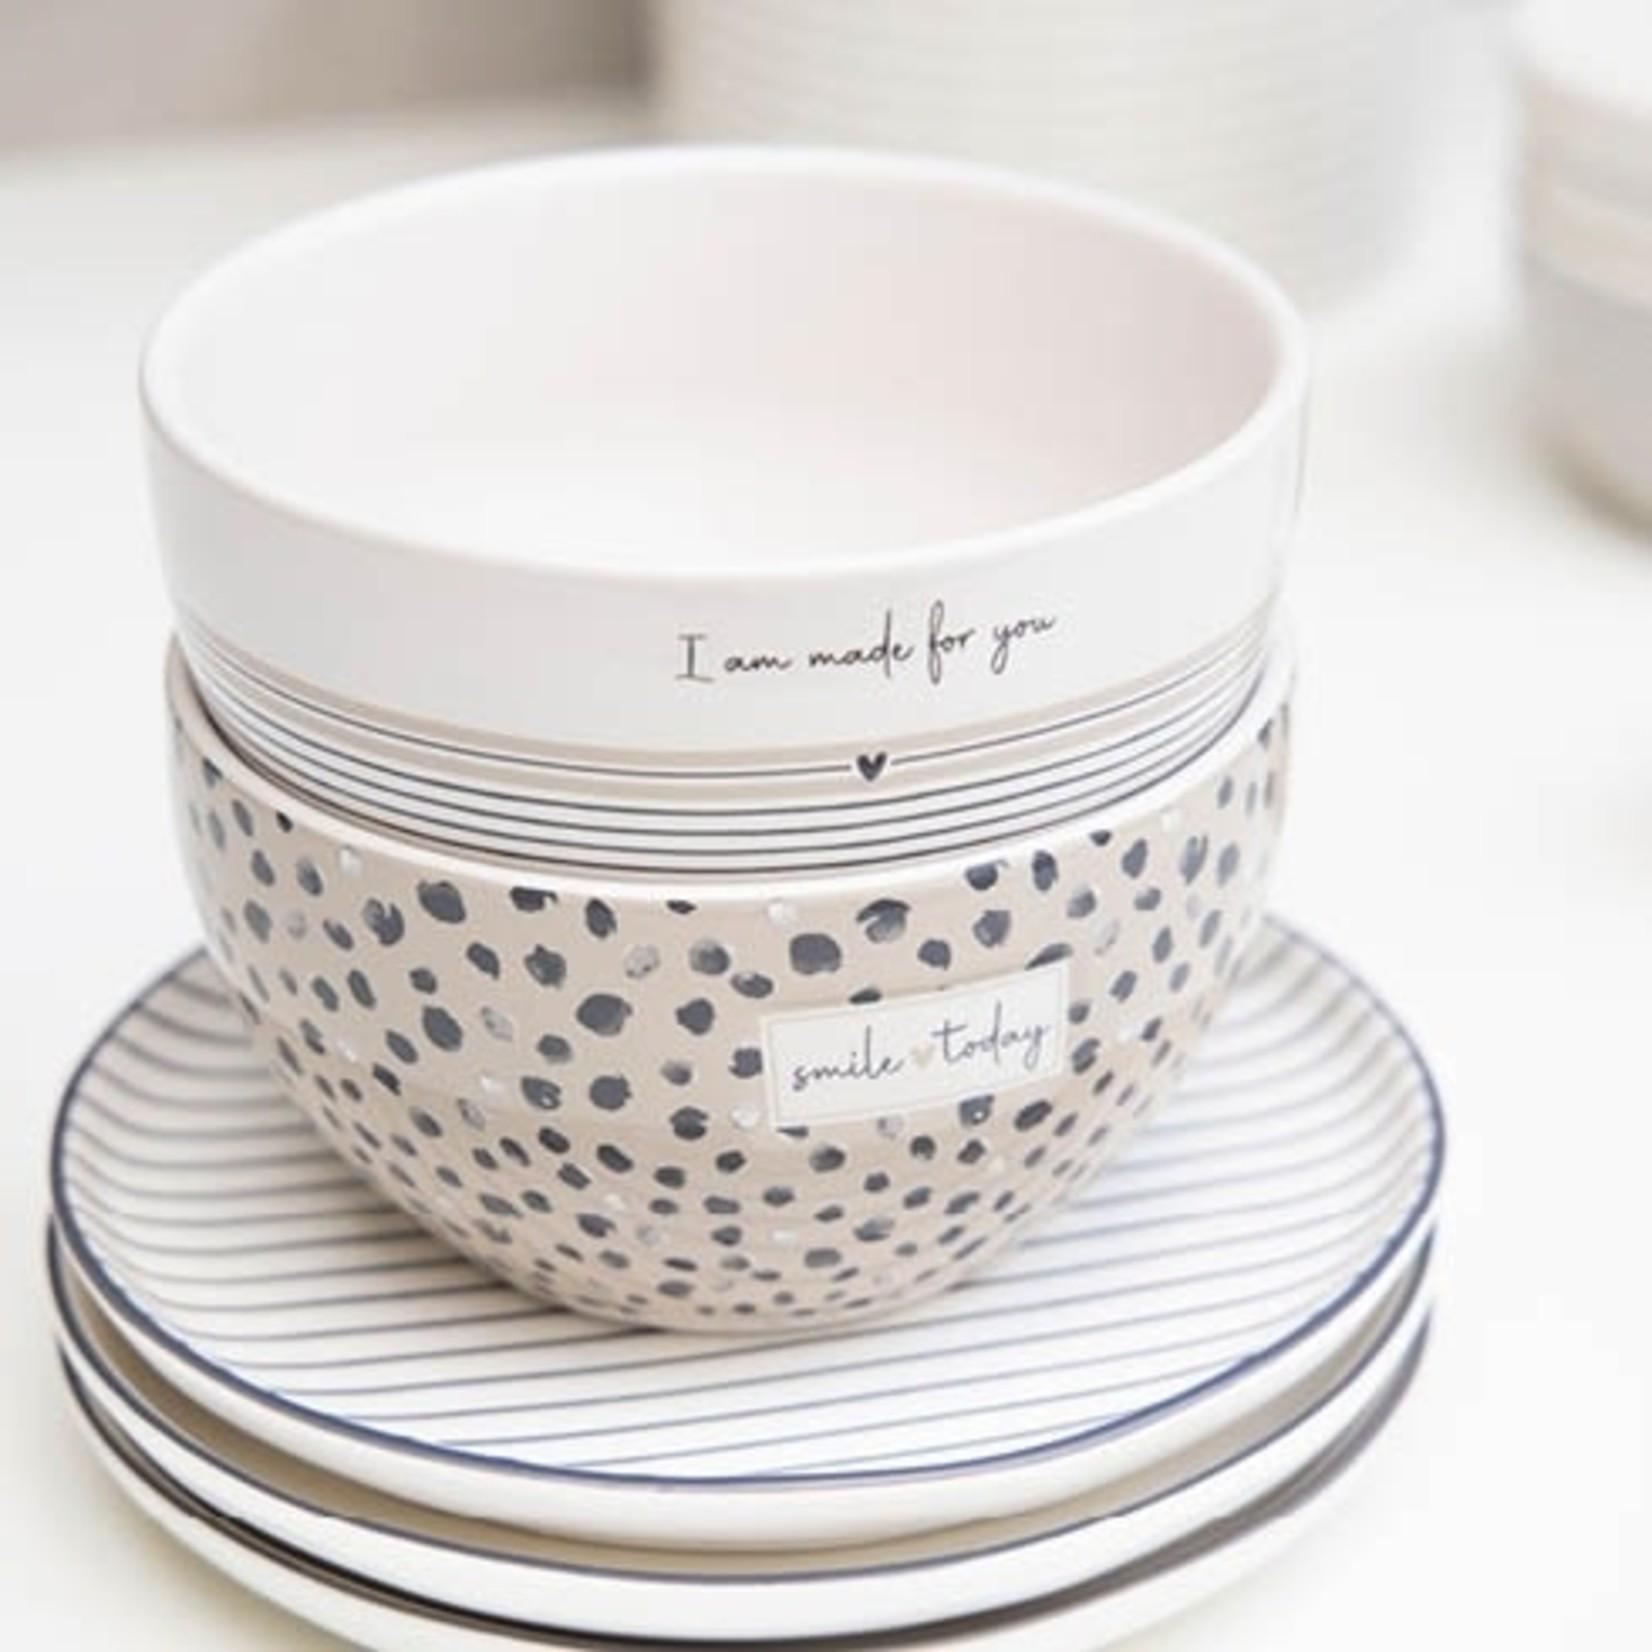 Bastion Collections Bowl Confetti Smile Today titane/black13x7 cm